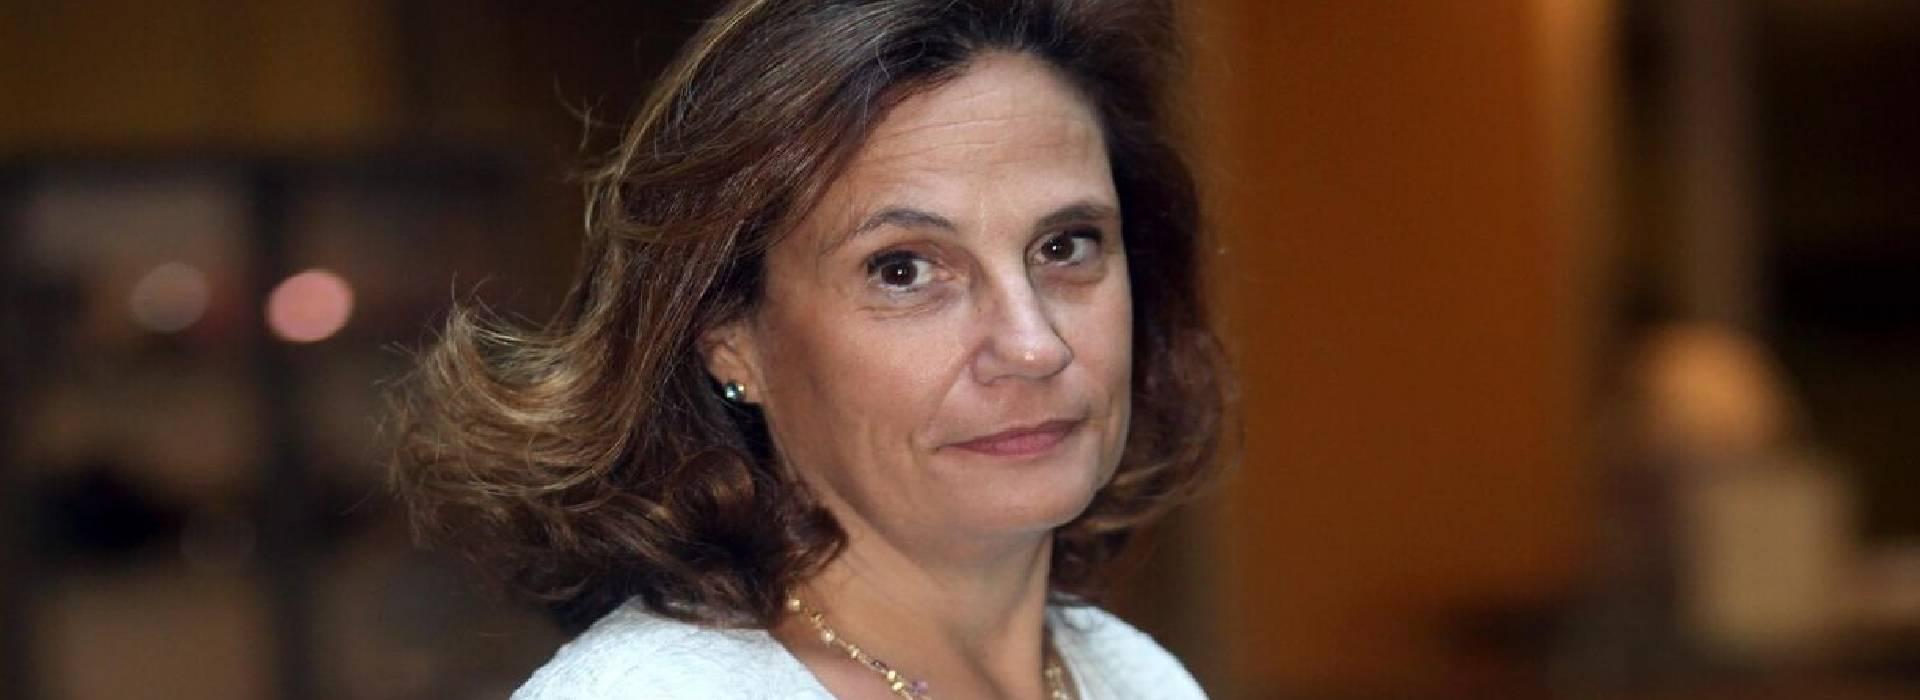 L'inchiesta su Ilaria Capua